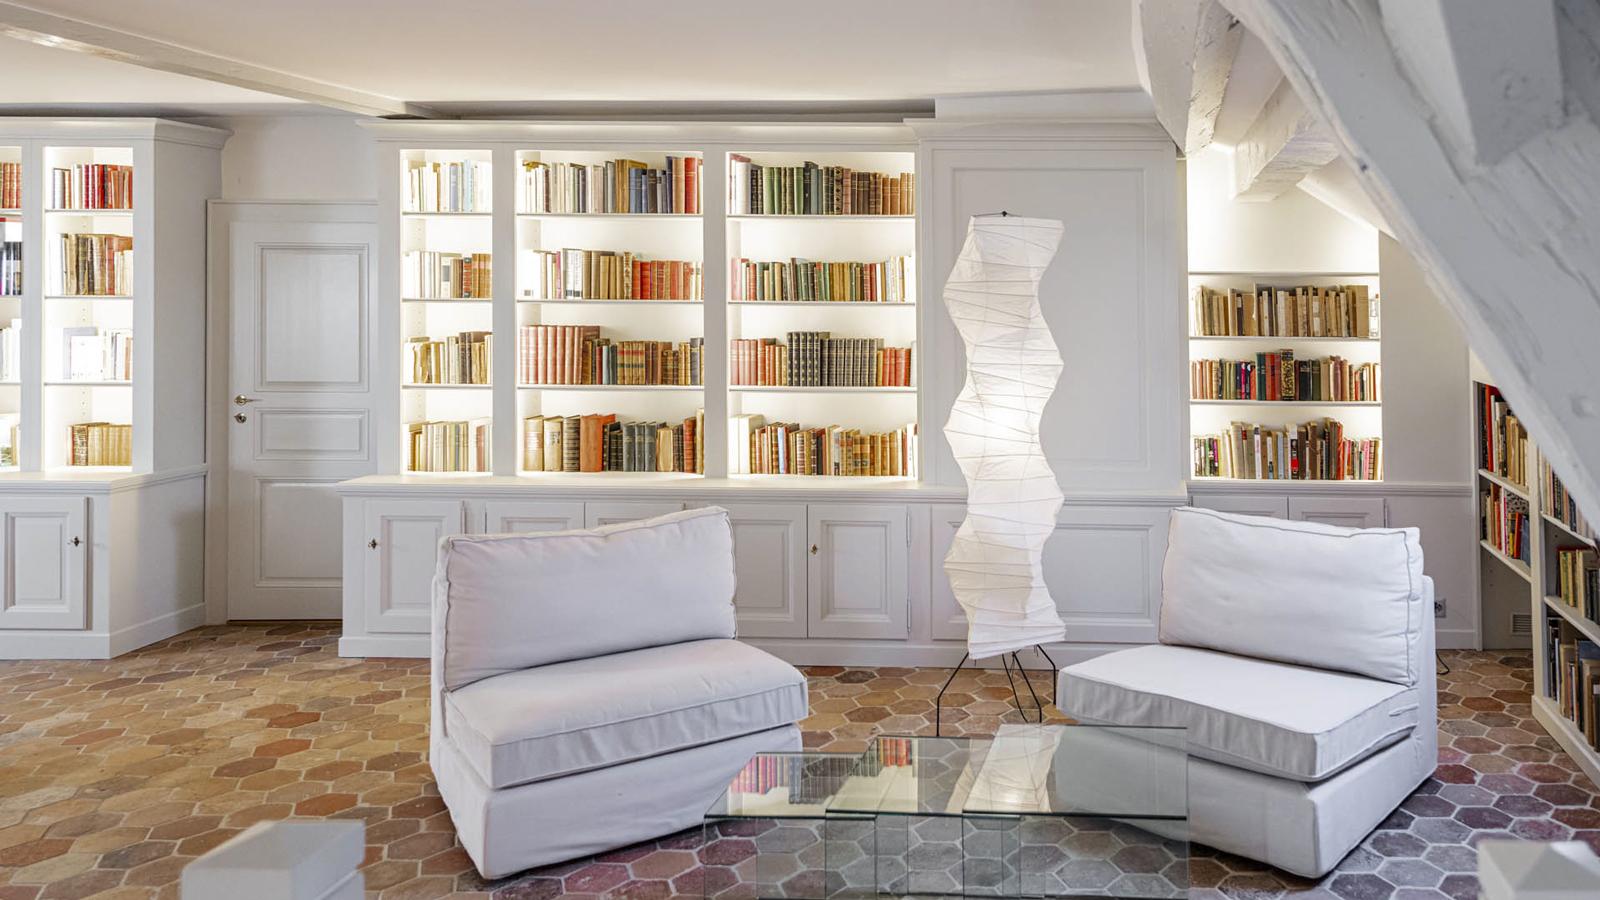 CSDK Architectes Bibliothe%CC%80que Cre%CC%81ation 8 - Custom-made bookcase - Geneva - CSDK Architectes Bibliothe%CC%80que Cre%CC%81ation 8